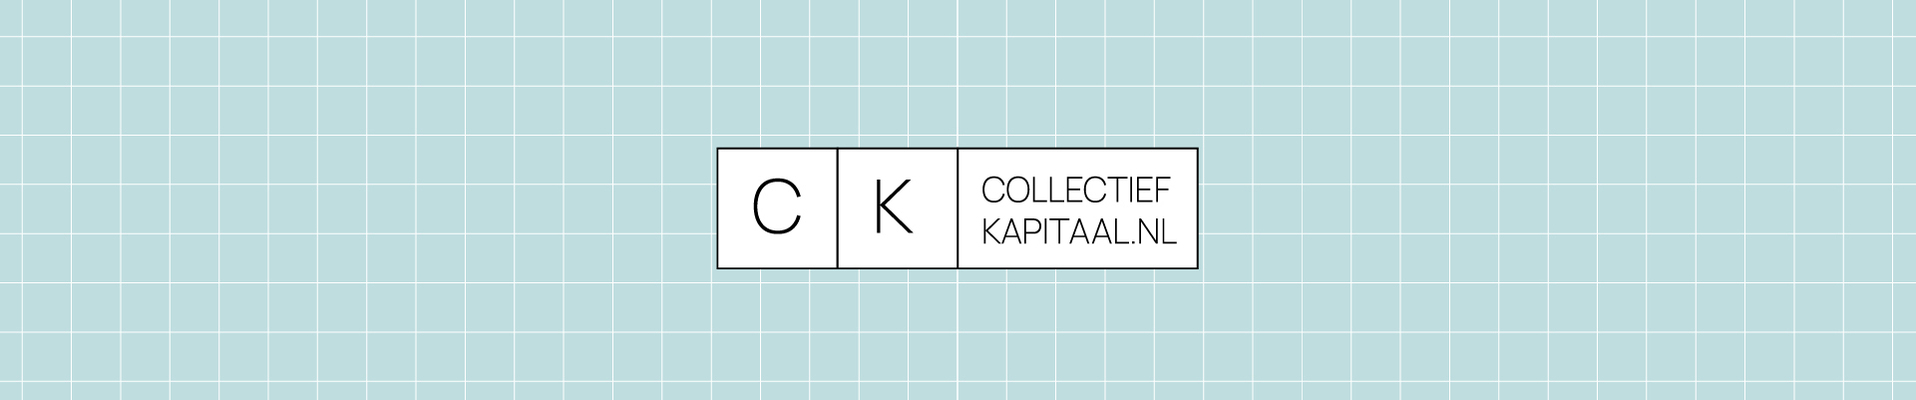 Collectief Kapitaal inschrijving